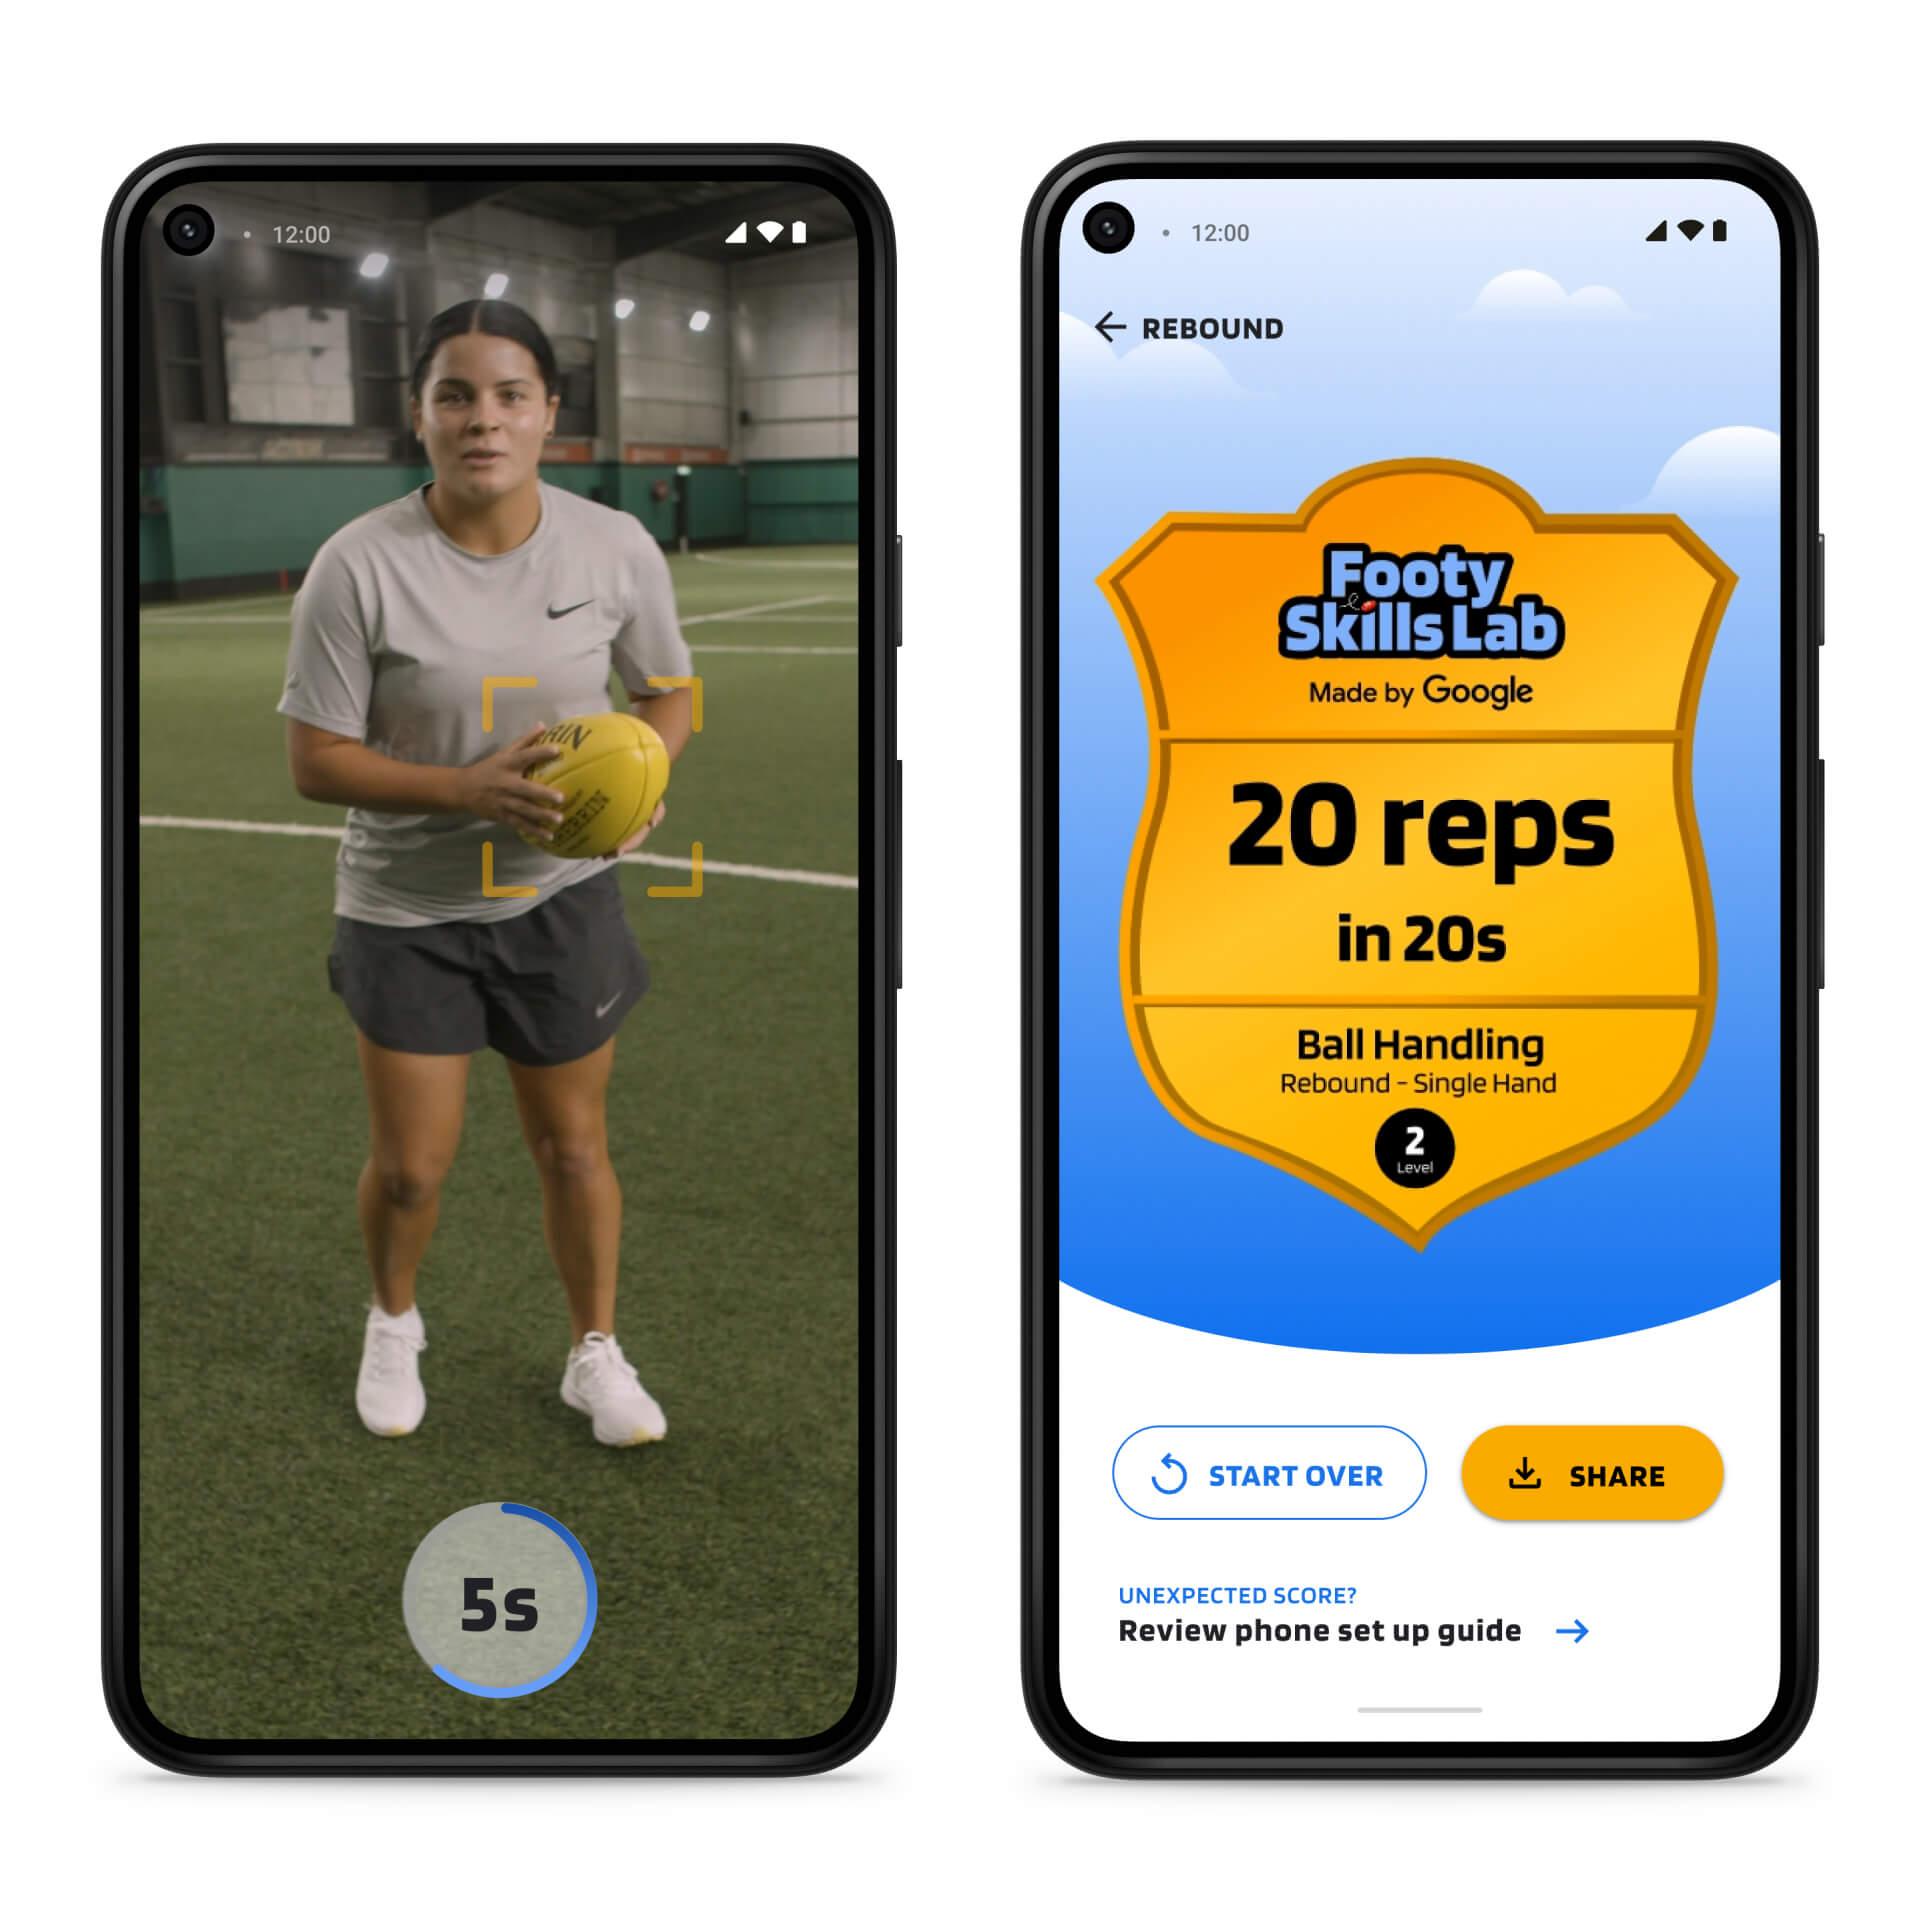 Two phone screens displaying the footyskillslab app